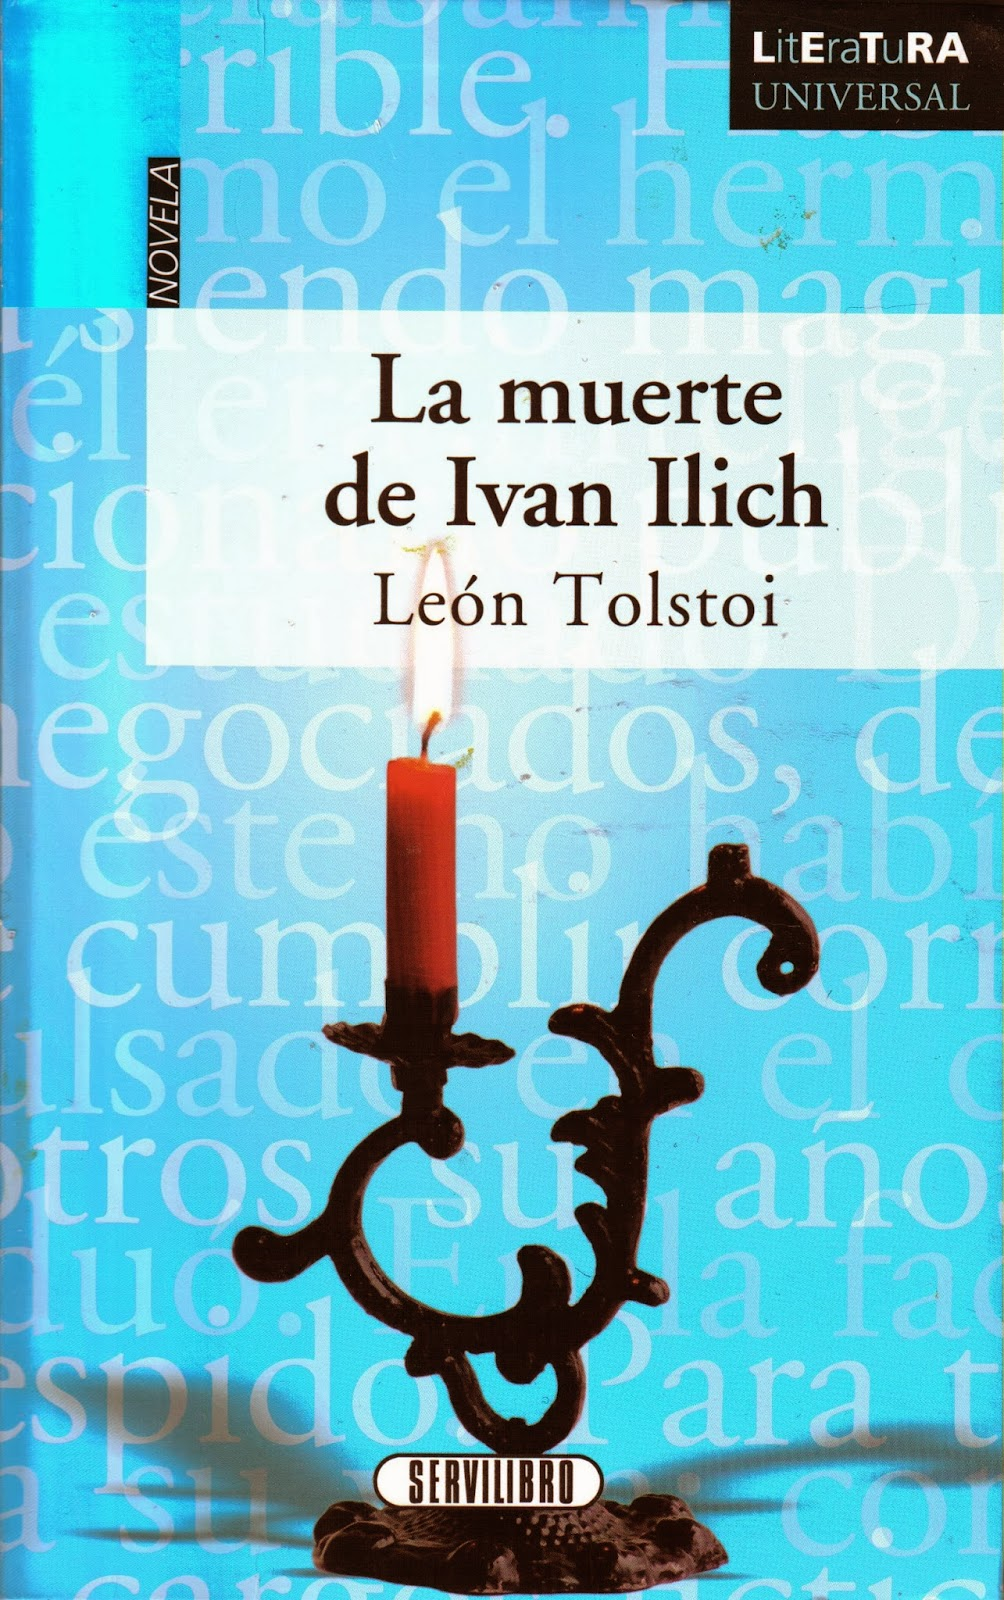 la muerte de ivan ilich de leon tolstoi: